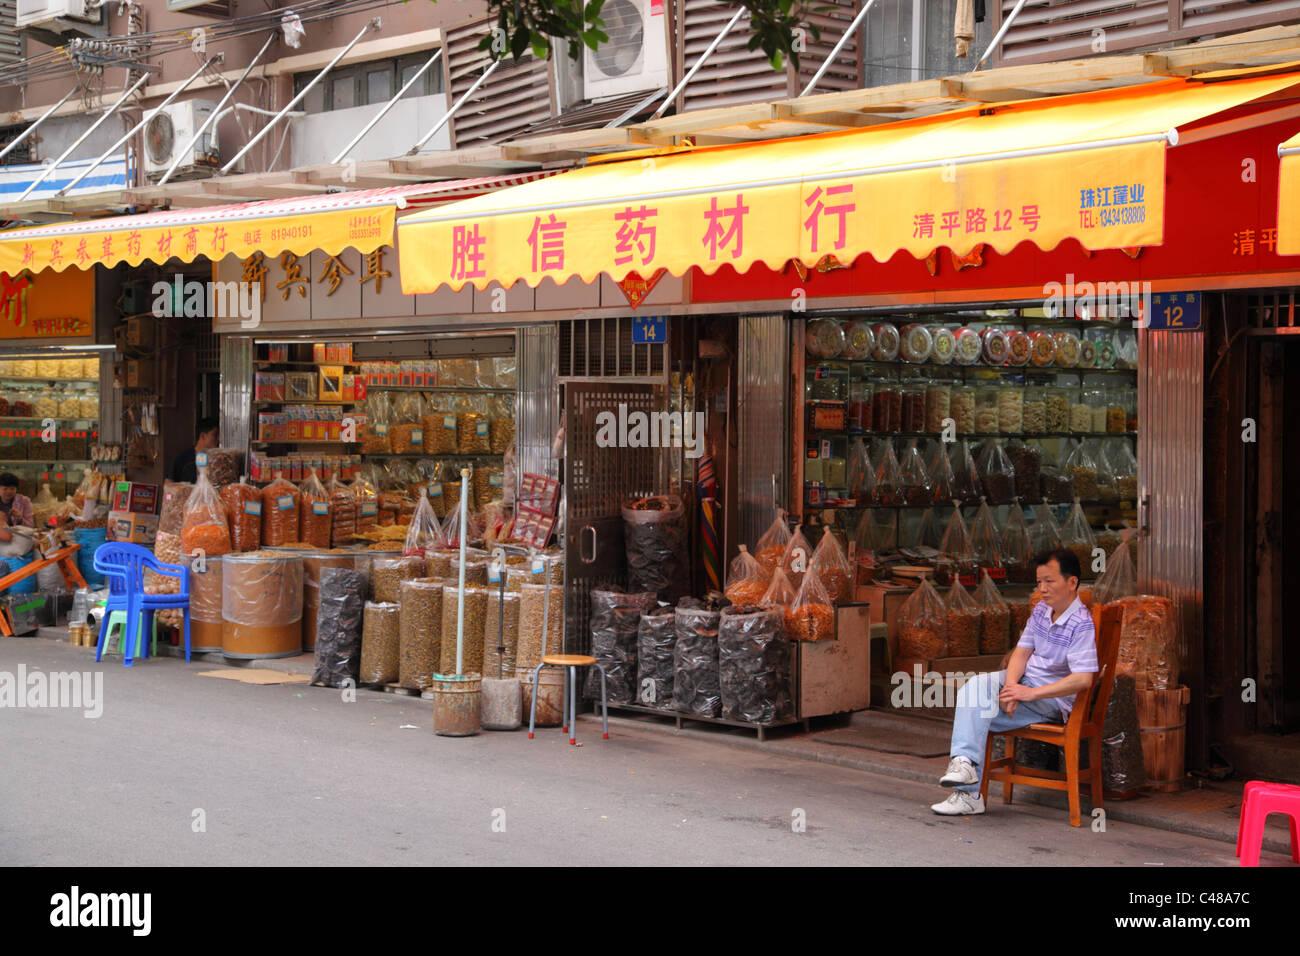 Medicine market, Guangzhou, China - Stock Image